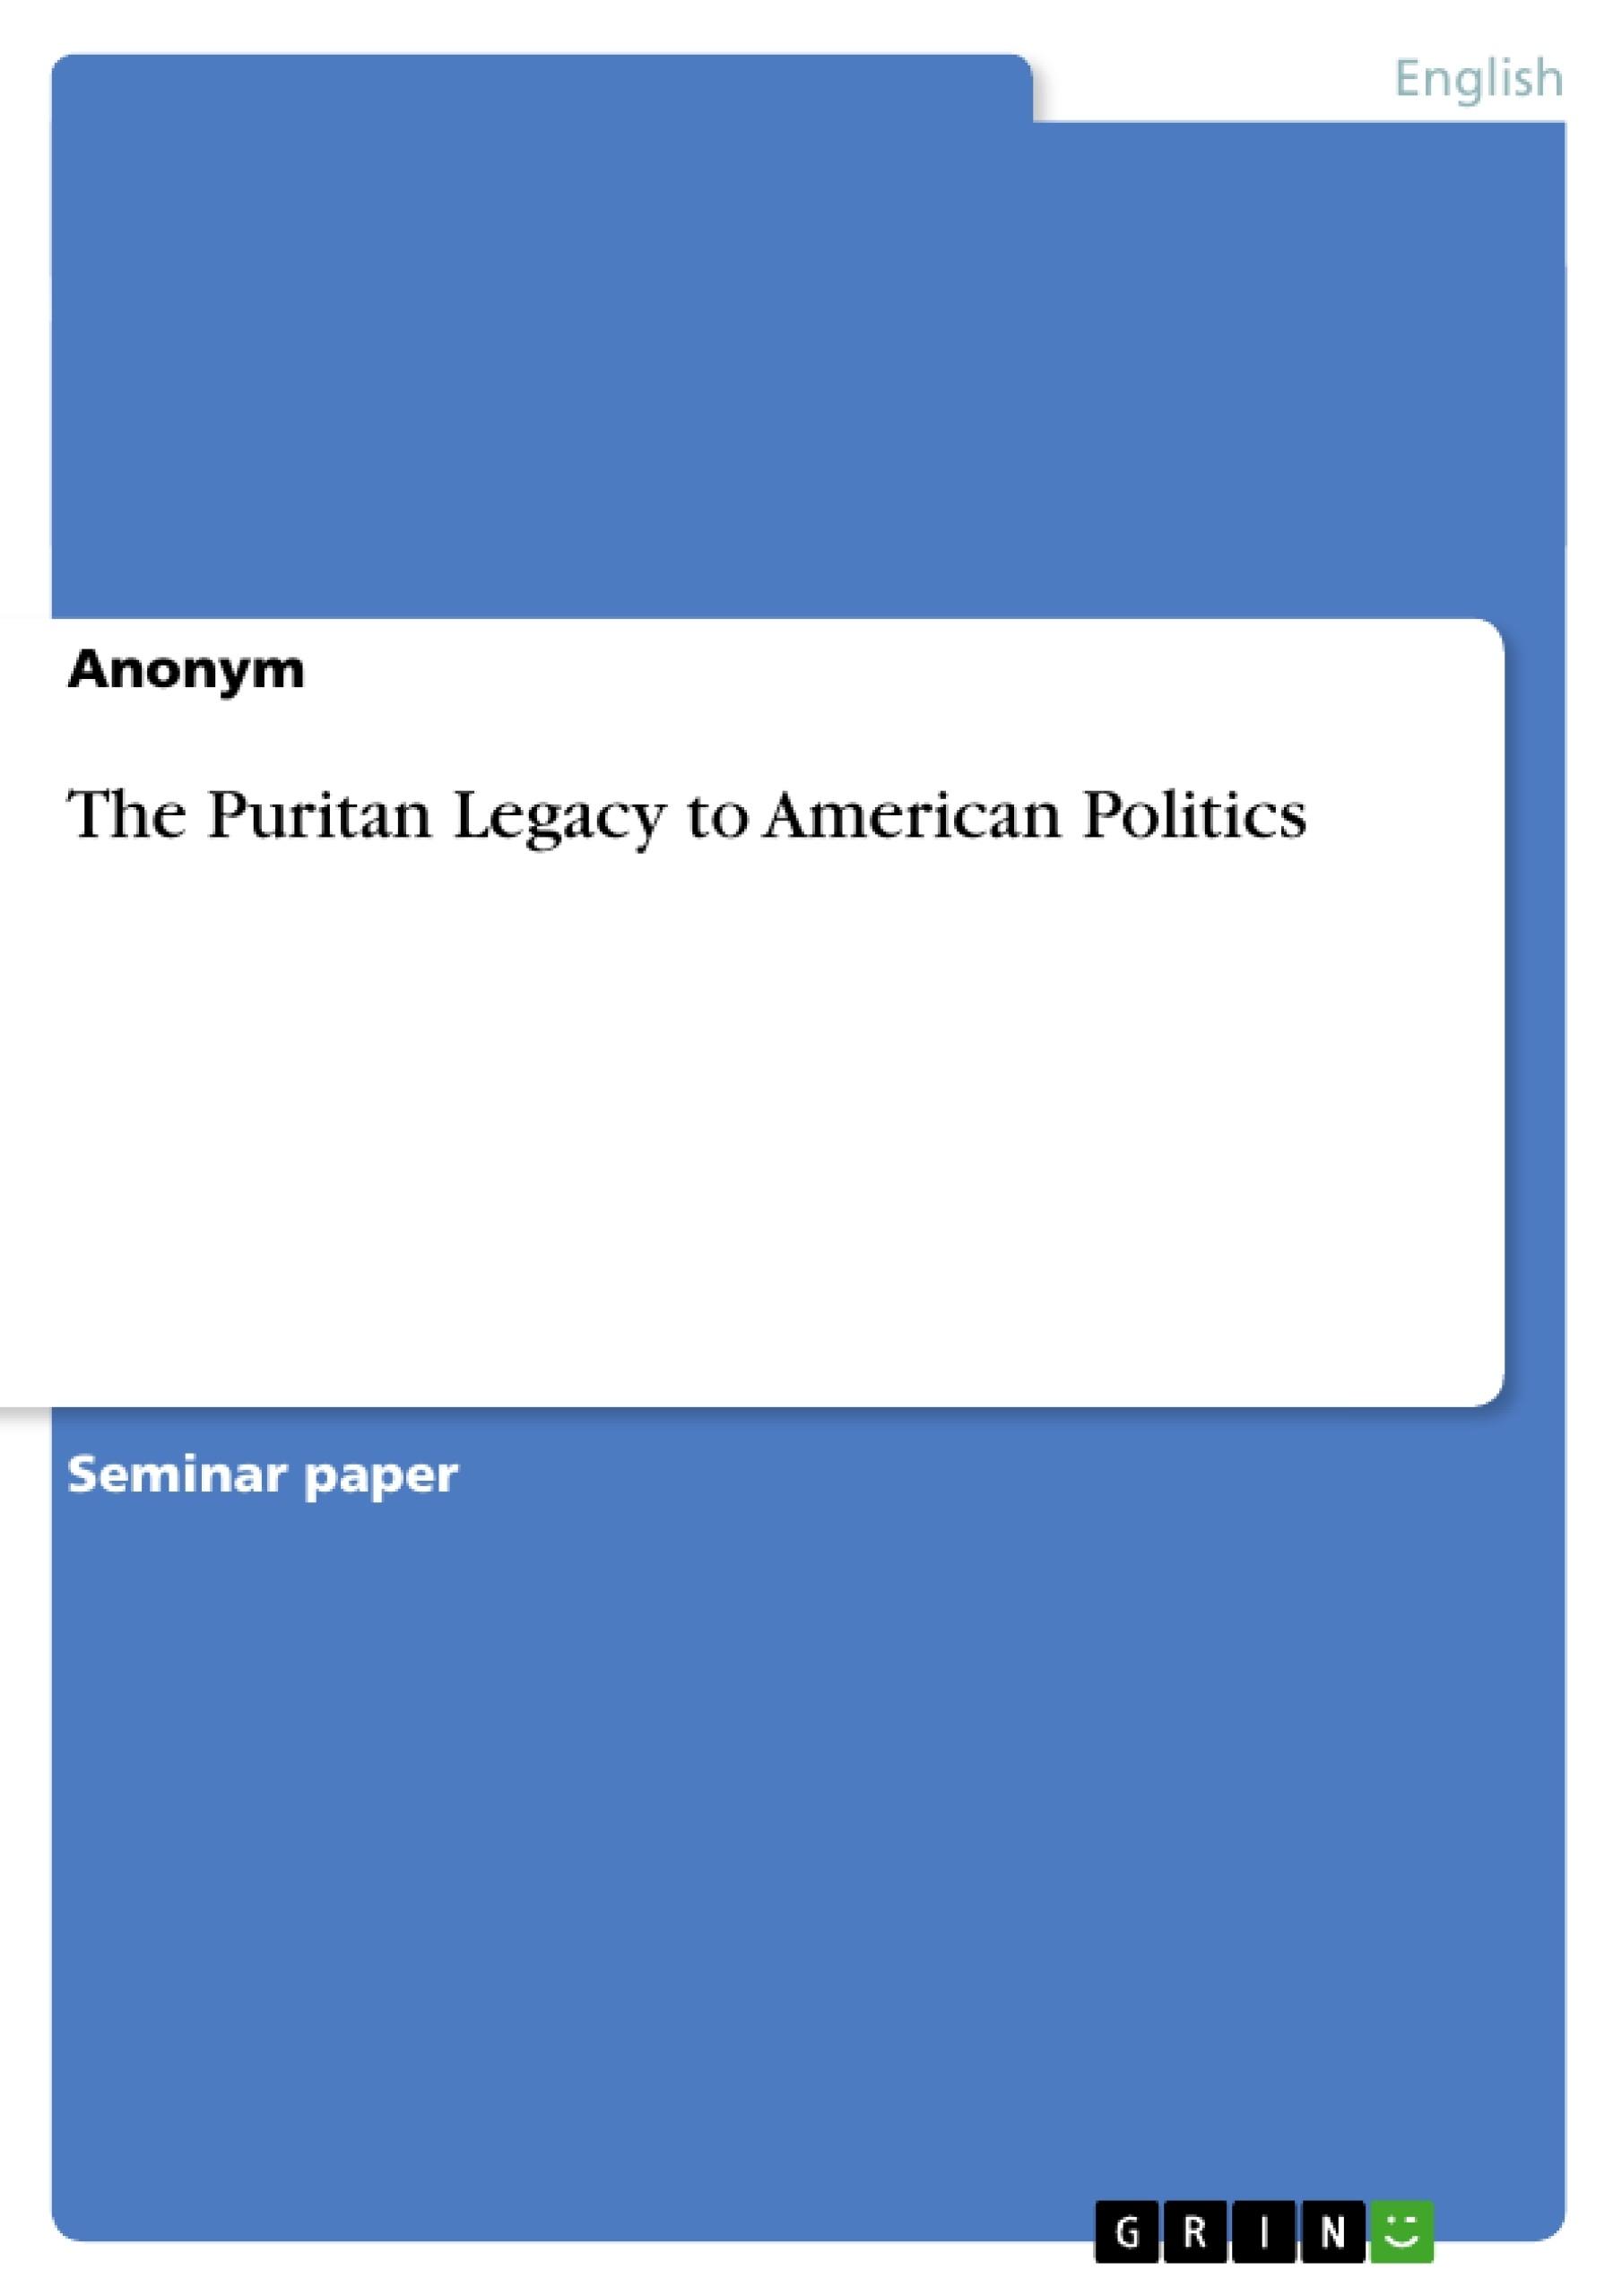 Title: The Puritan Legacy to American Politics